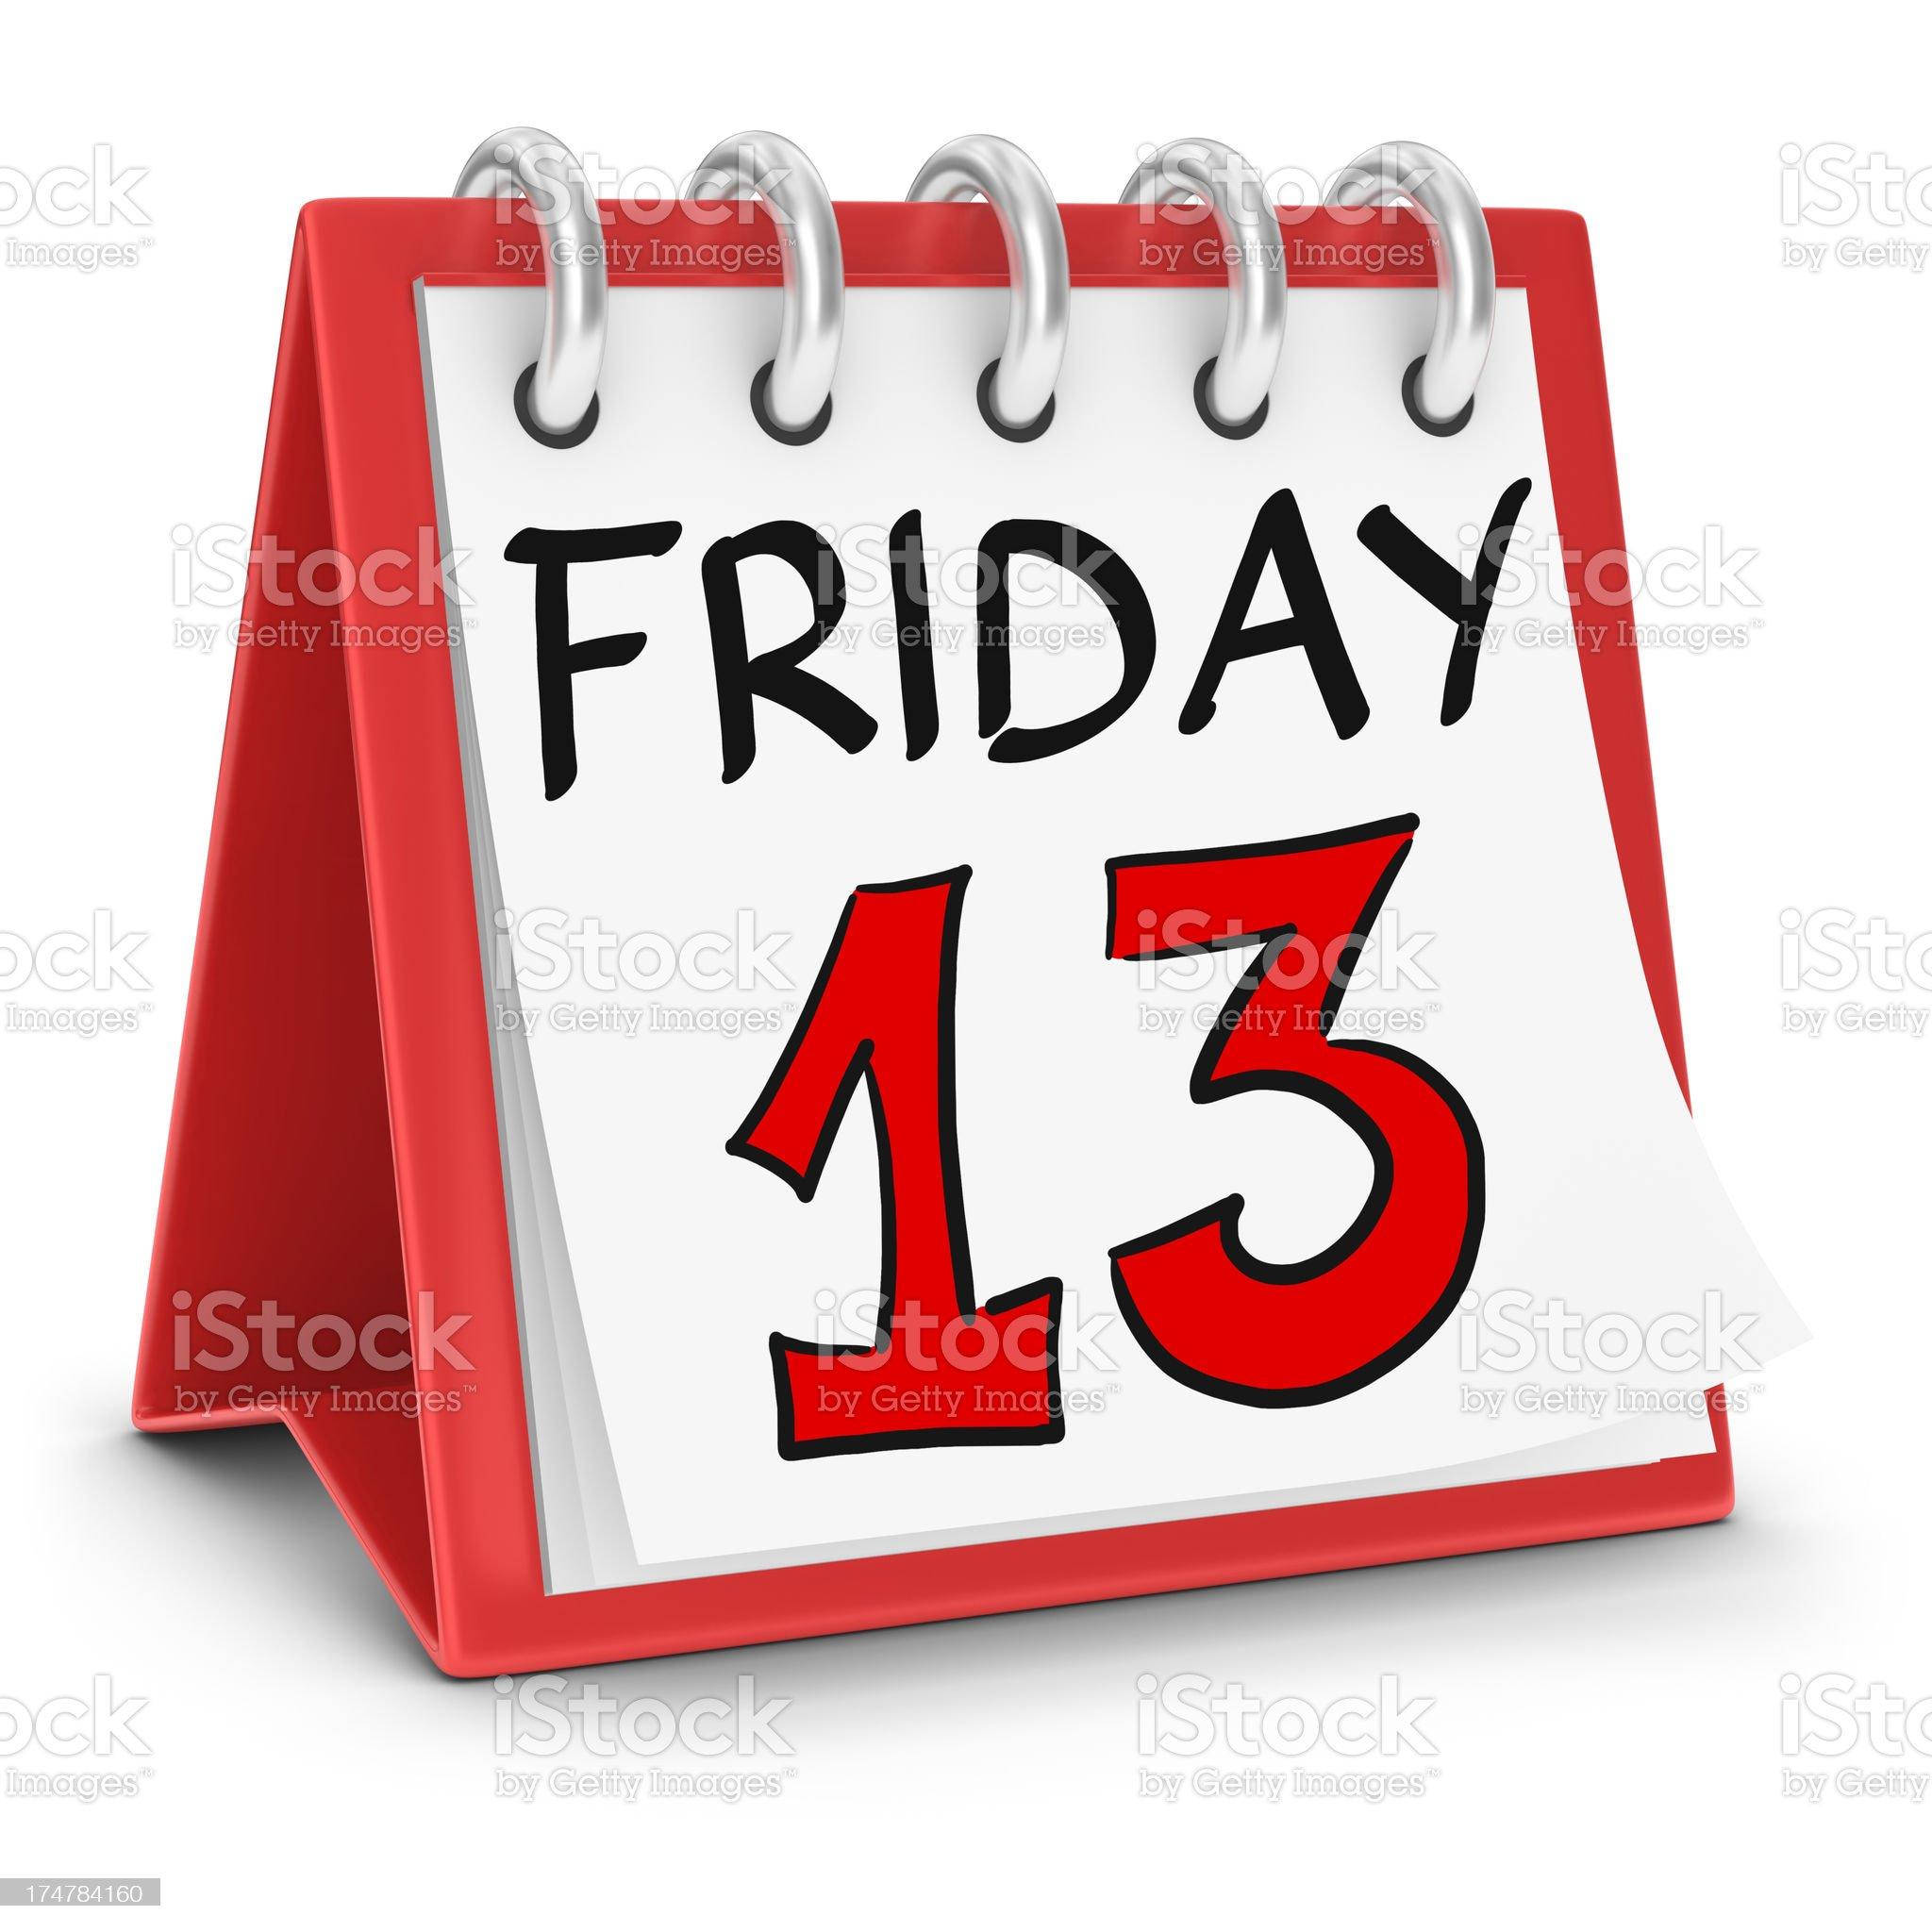 Calendar - Friday the 13th royalty-free stock photo